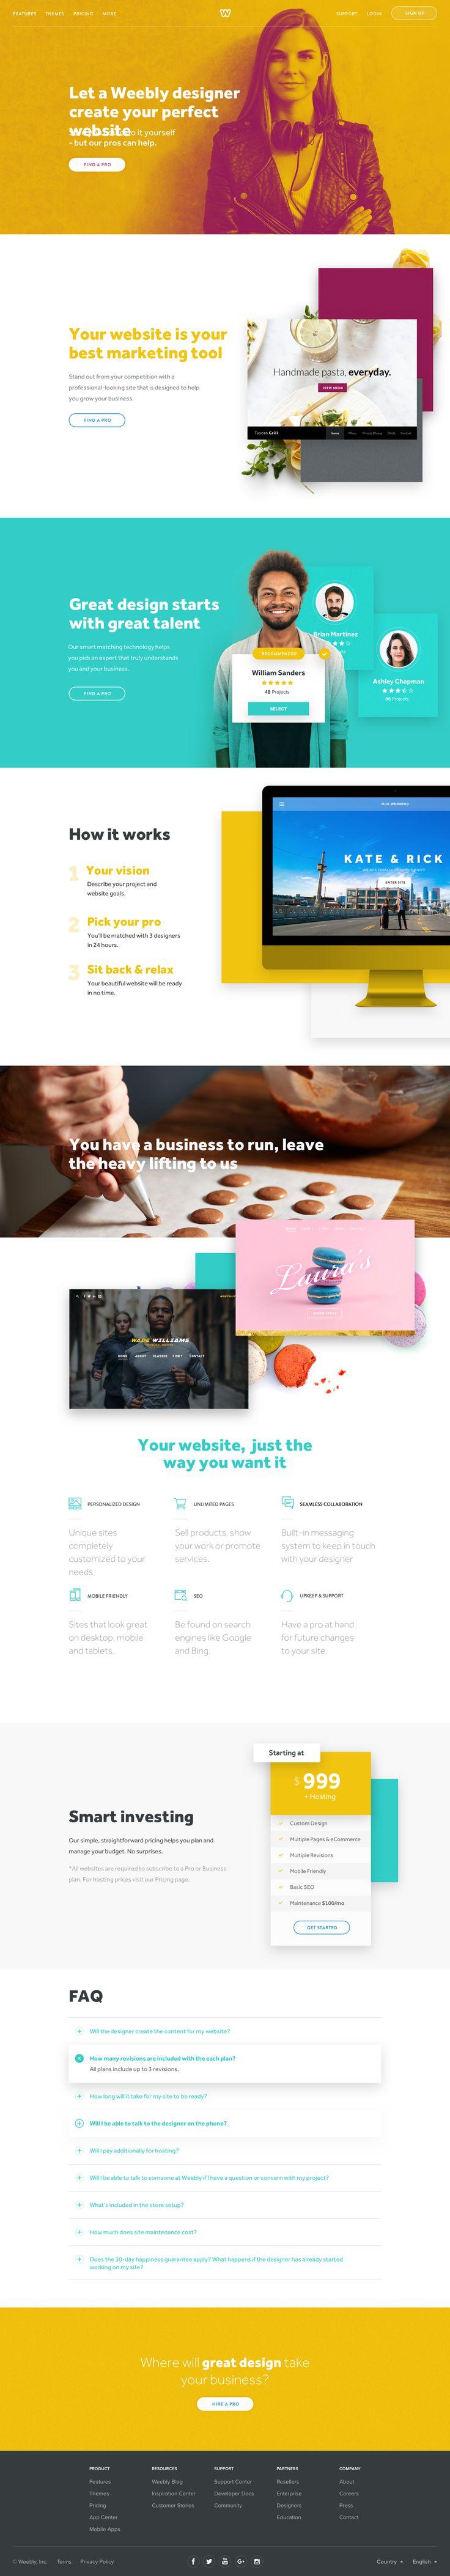 Design services landing page